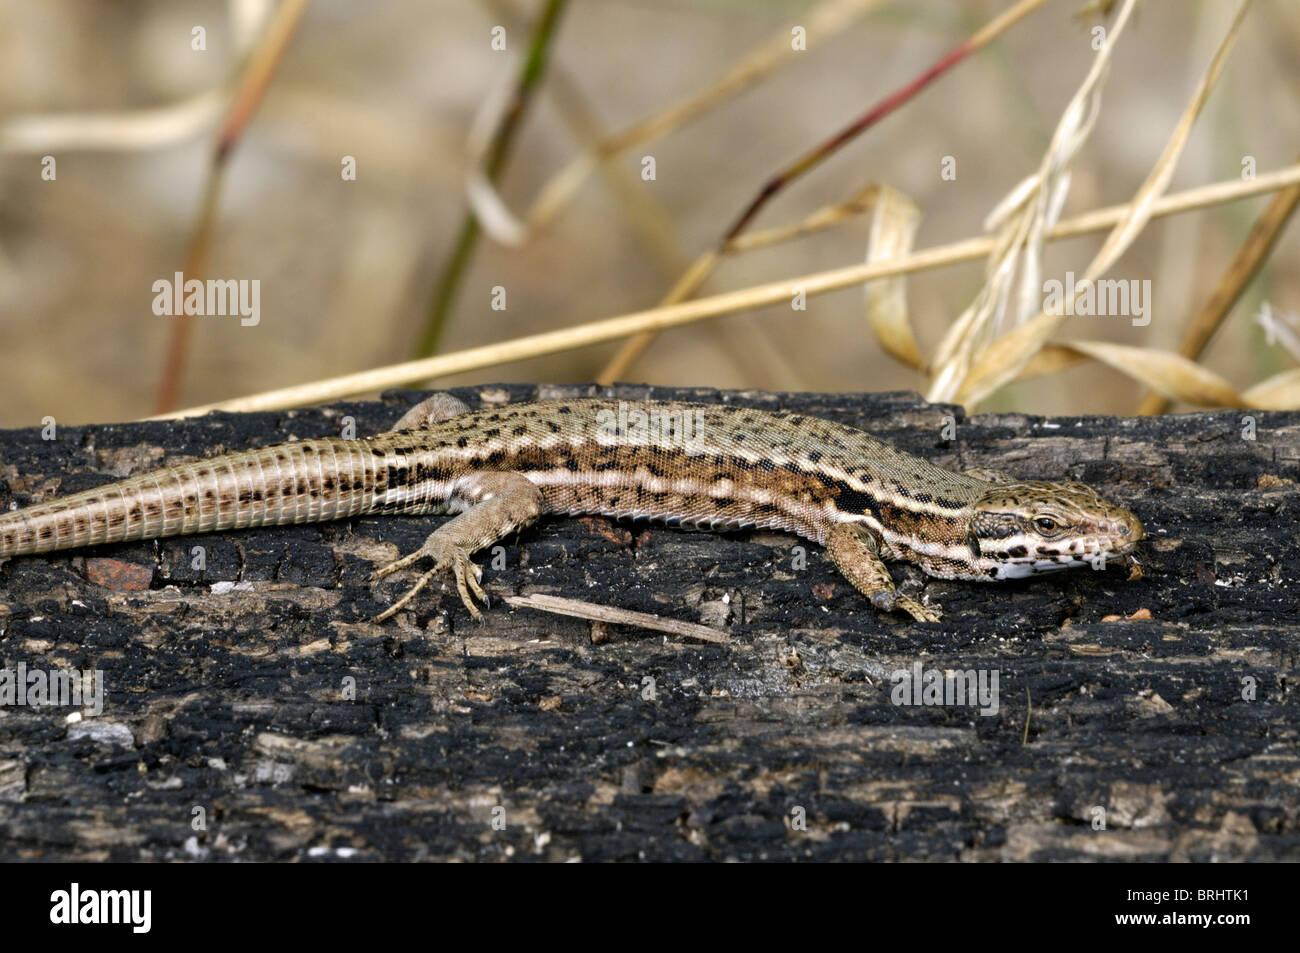 Common wall lizard (Podarcis / Lacerta muralis) sunning on burned wood Stock Photo